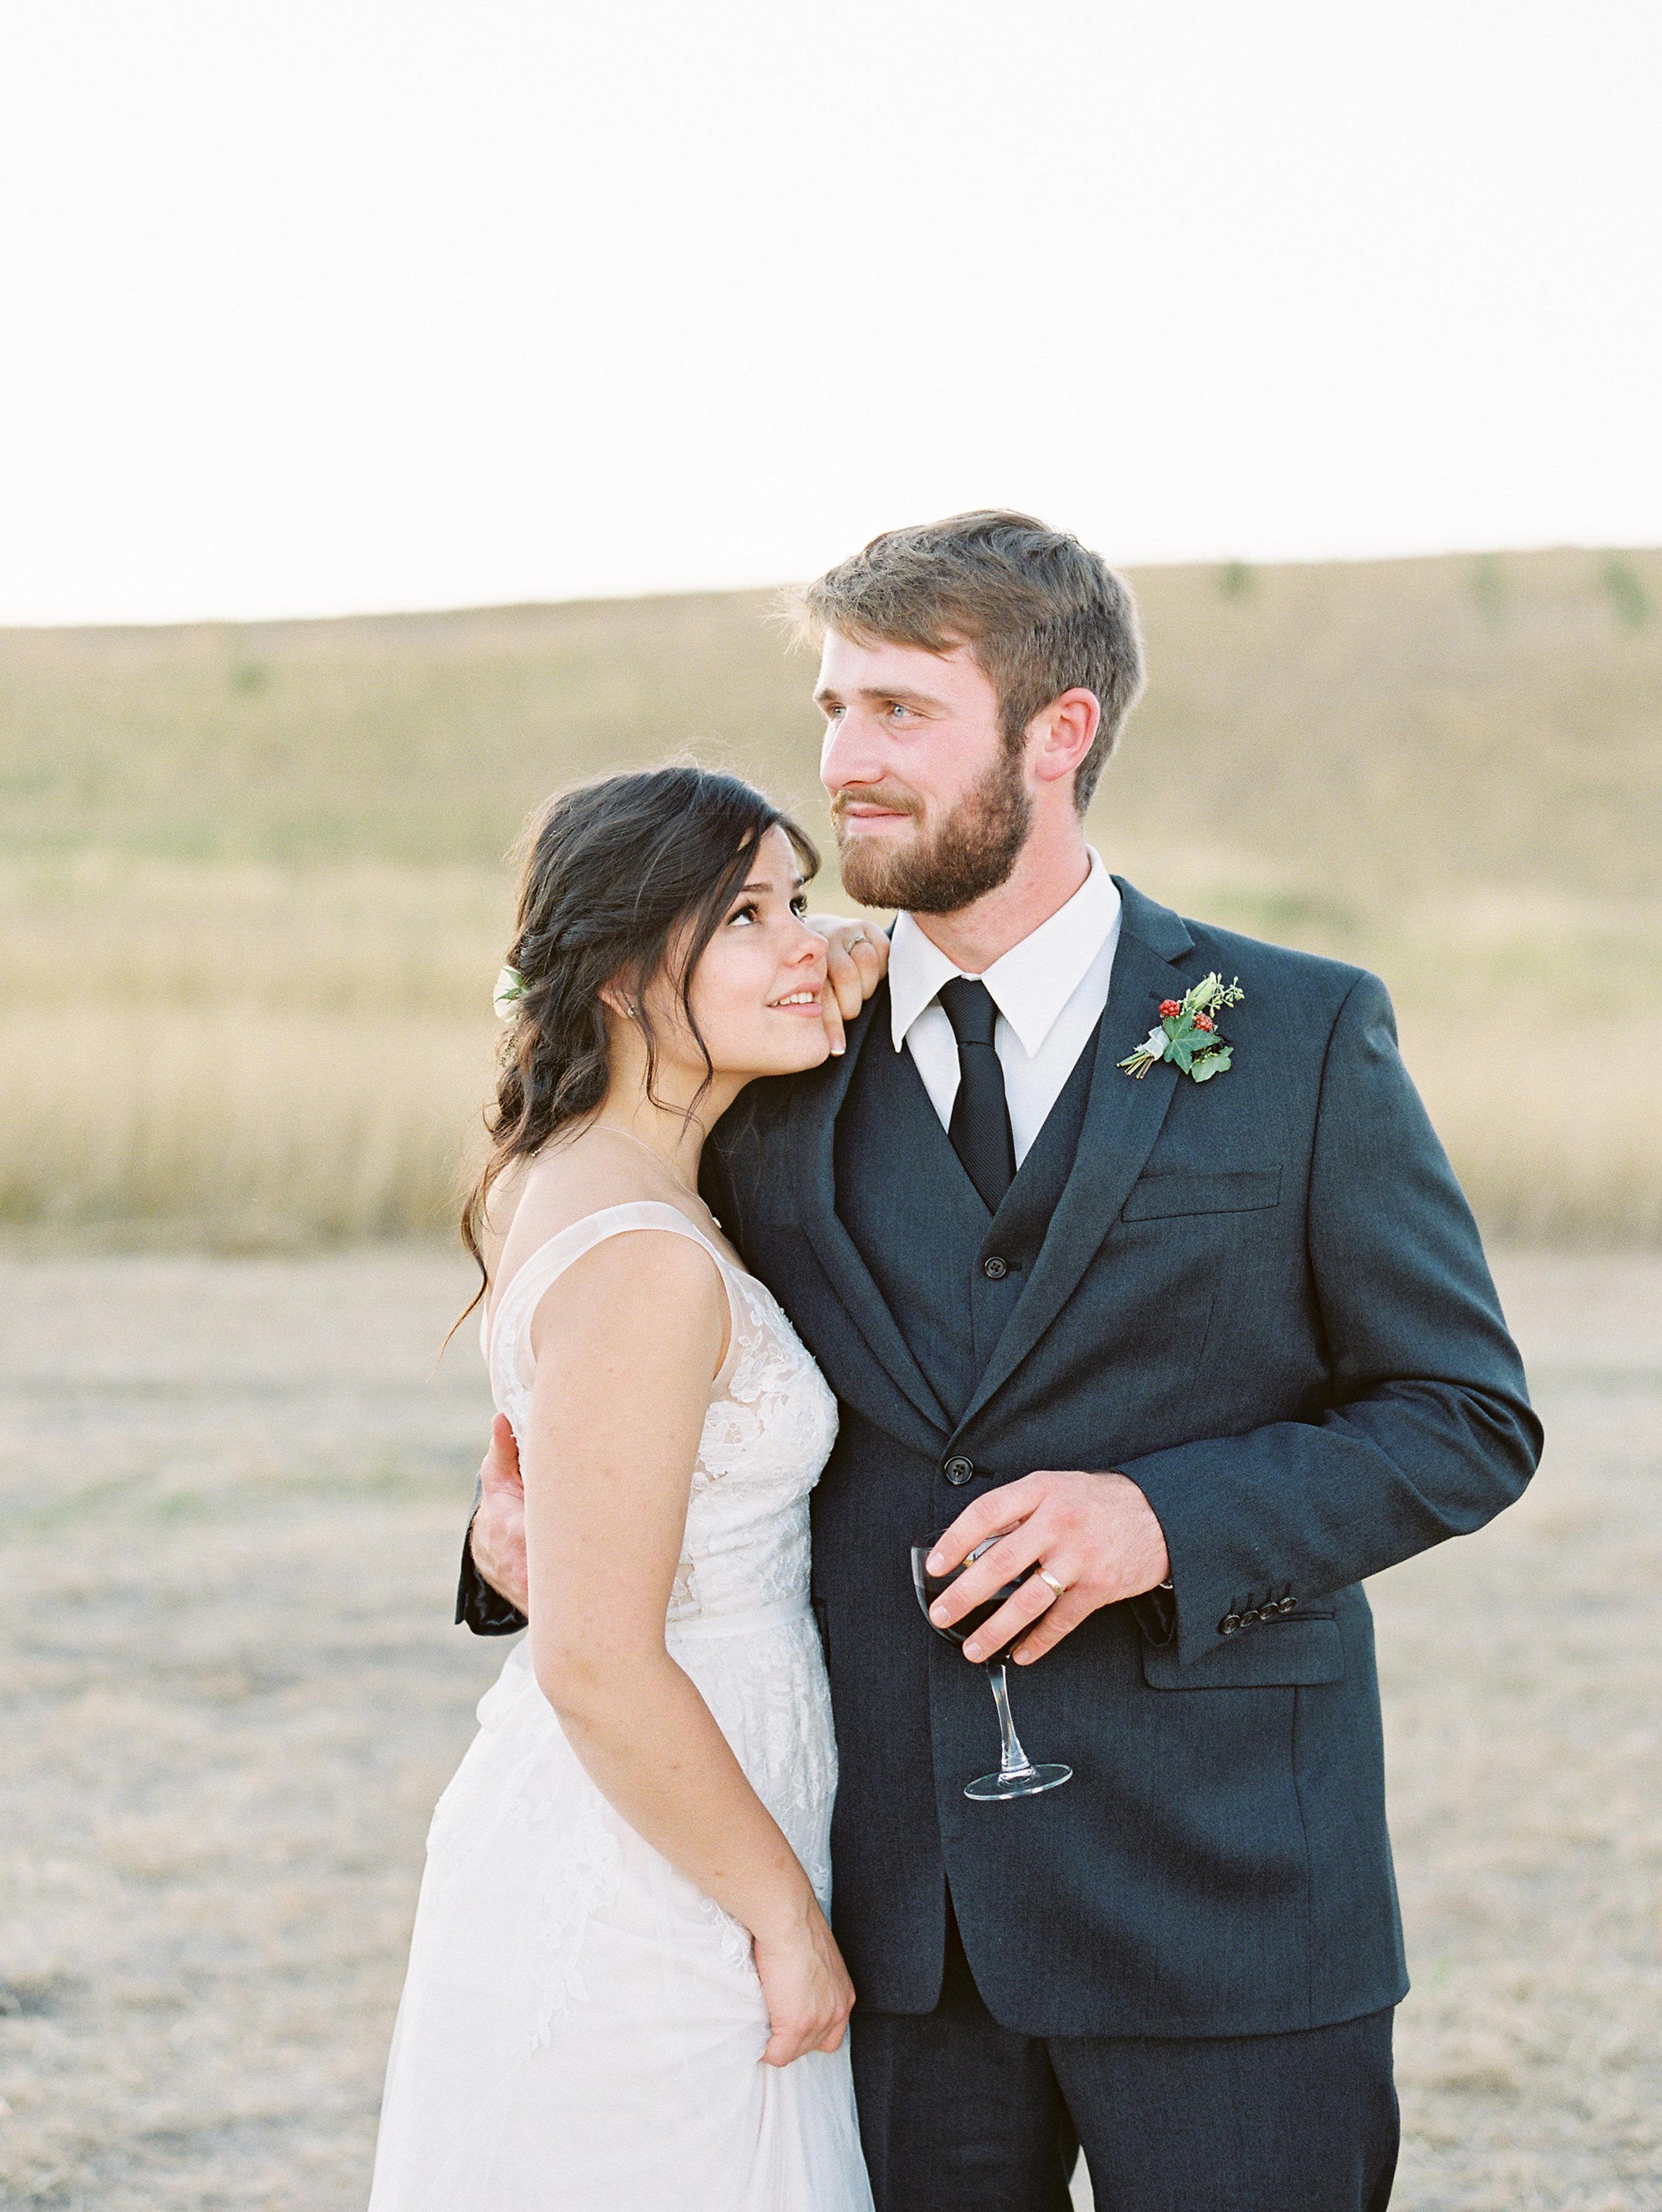 Idaho-Field-Forest-Wedding-Film-Photographer-Kristina-Adams-707 (1).jpg